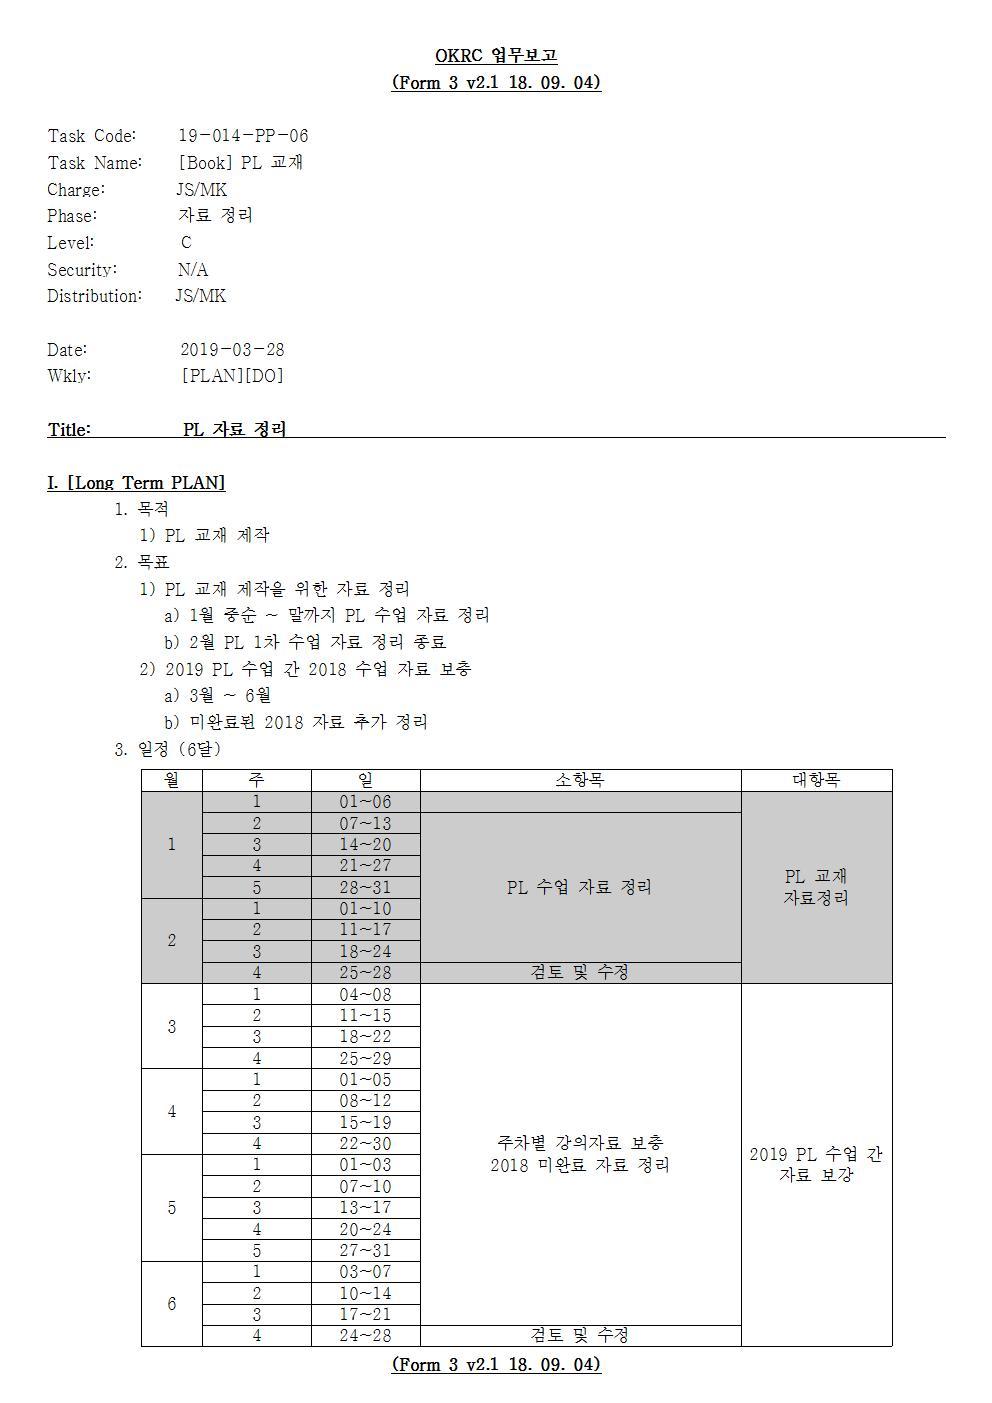 D-[19-014-PP-06]-[Book-PL]-[2019-03-28][JS]001.jpg